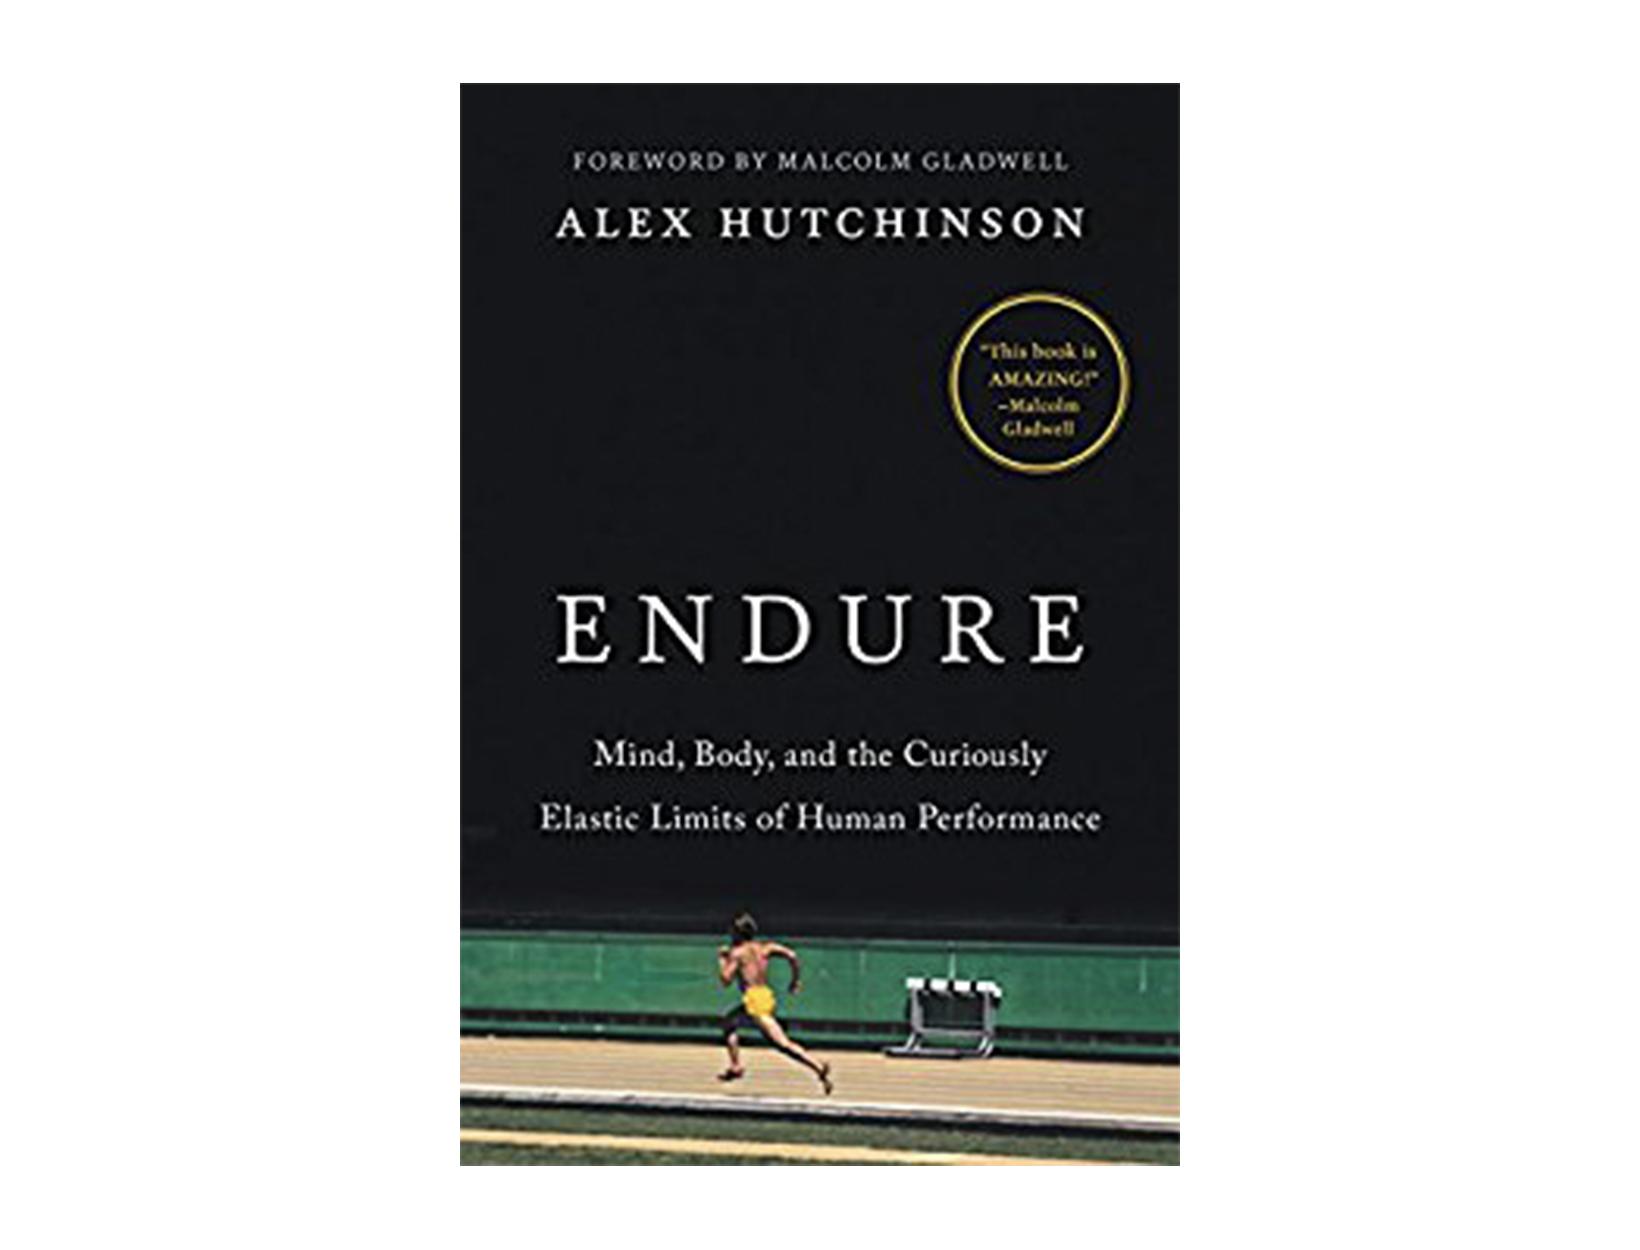 <em>Endure</em> by Alex Hutchinson